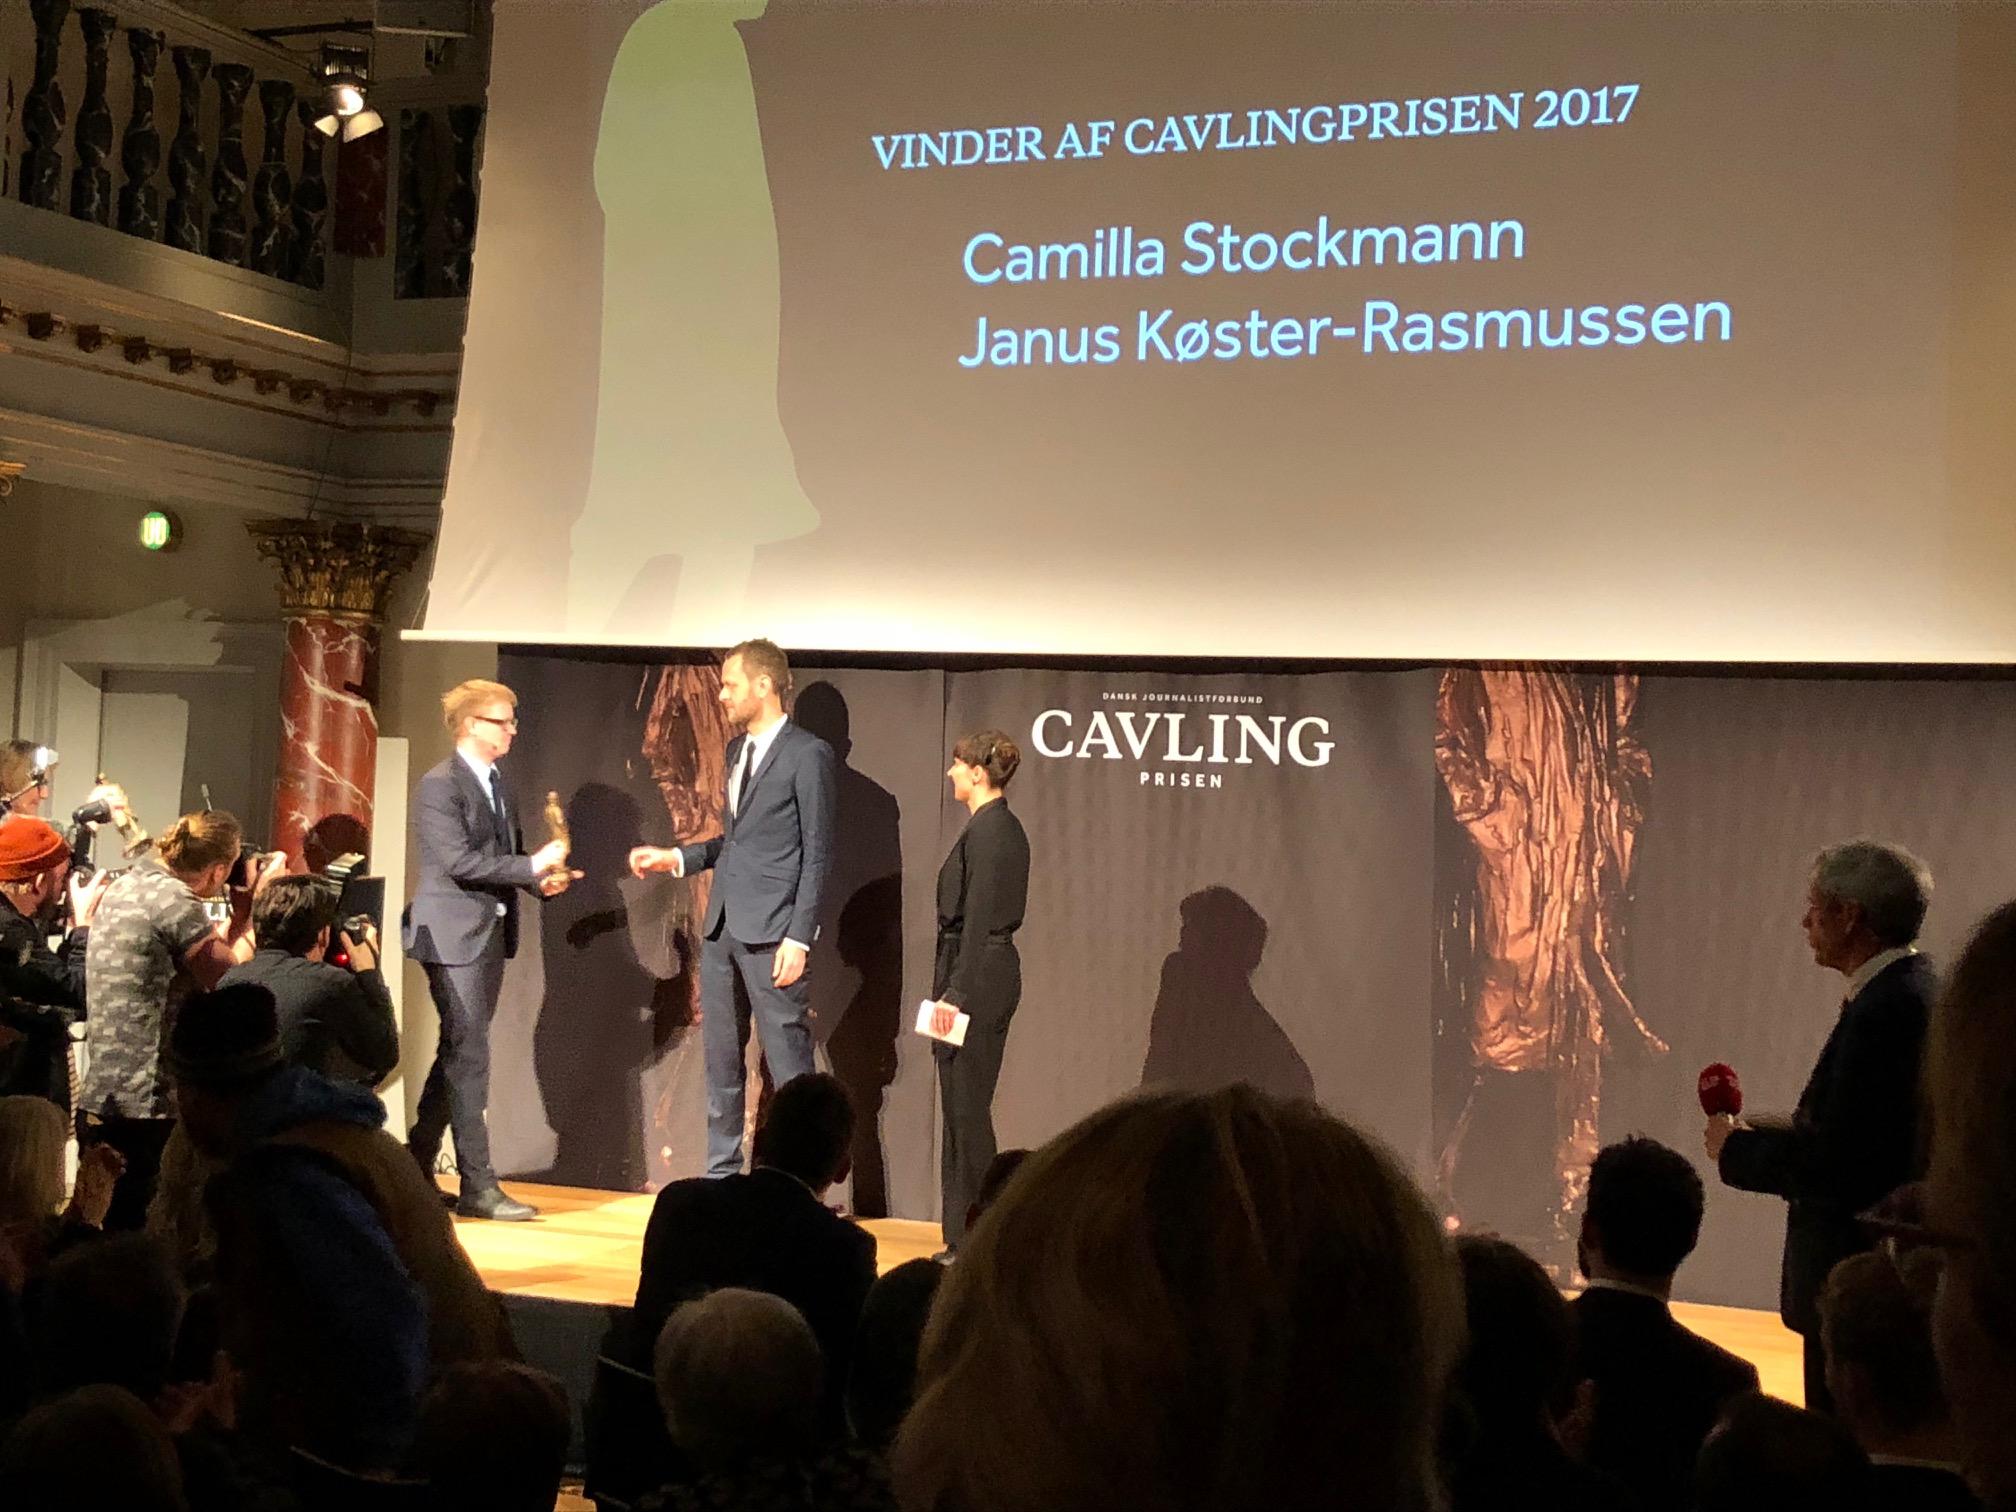 Cavlingprisen 2017